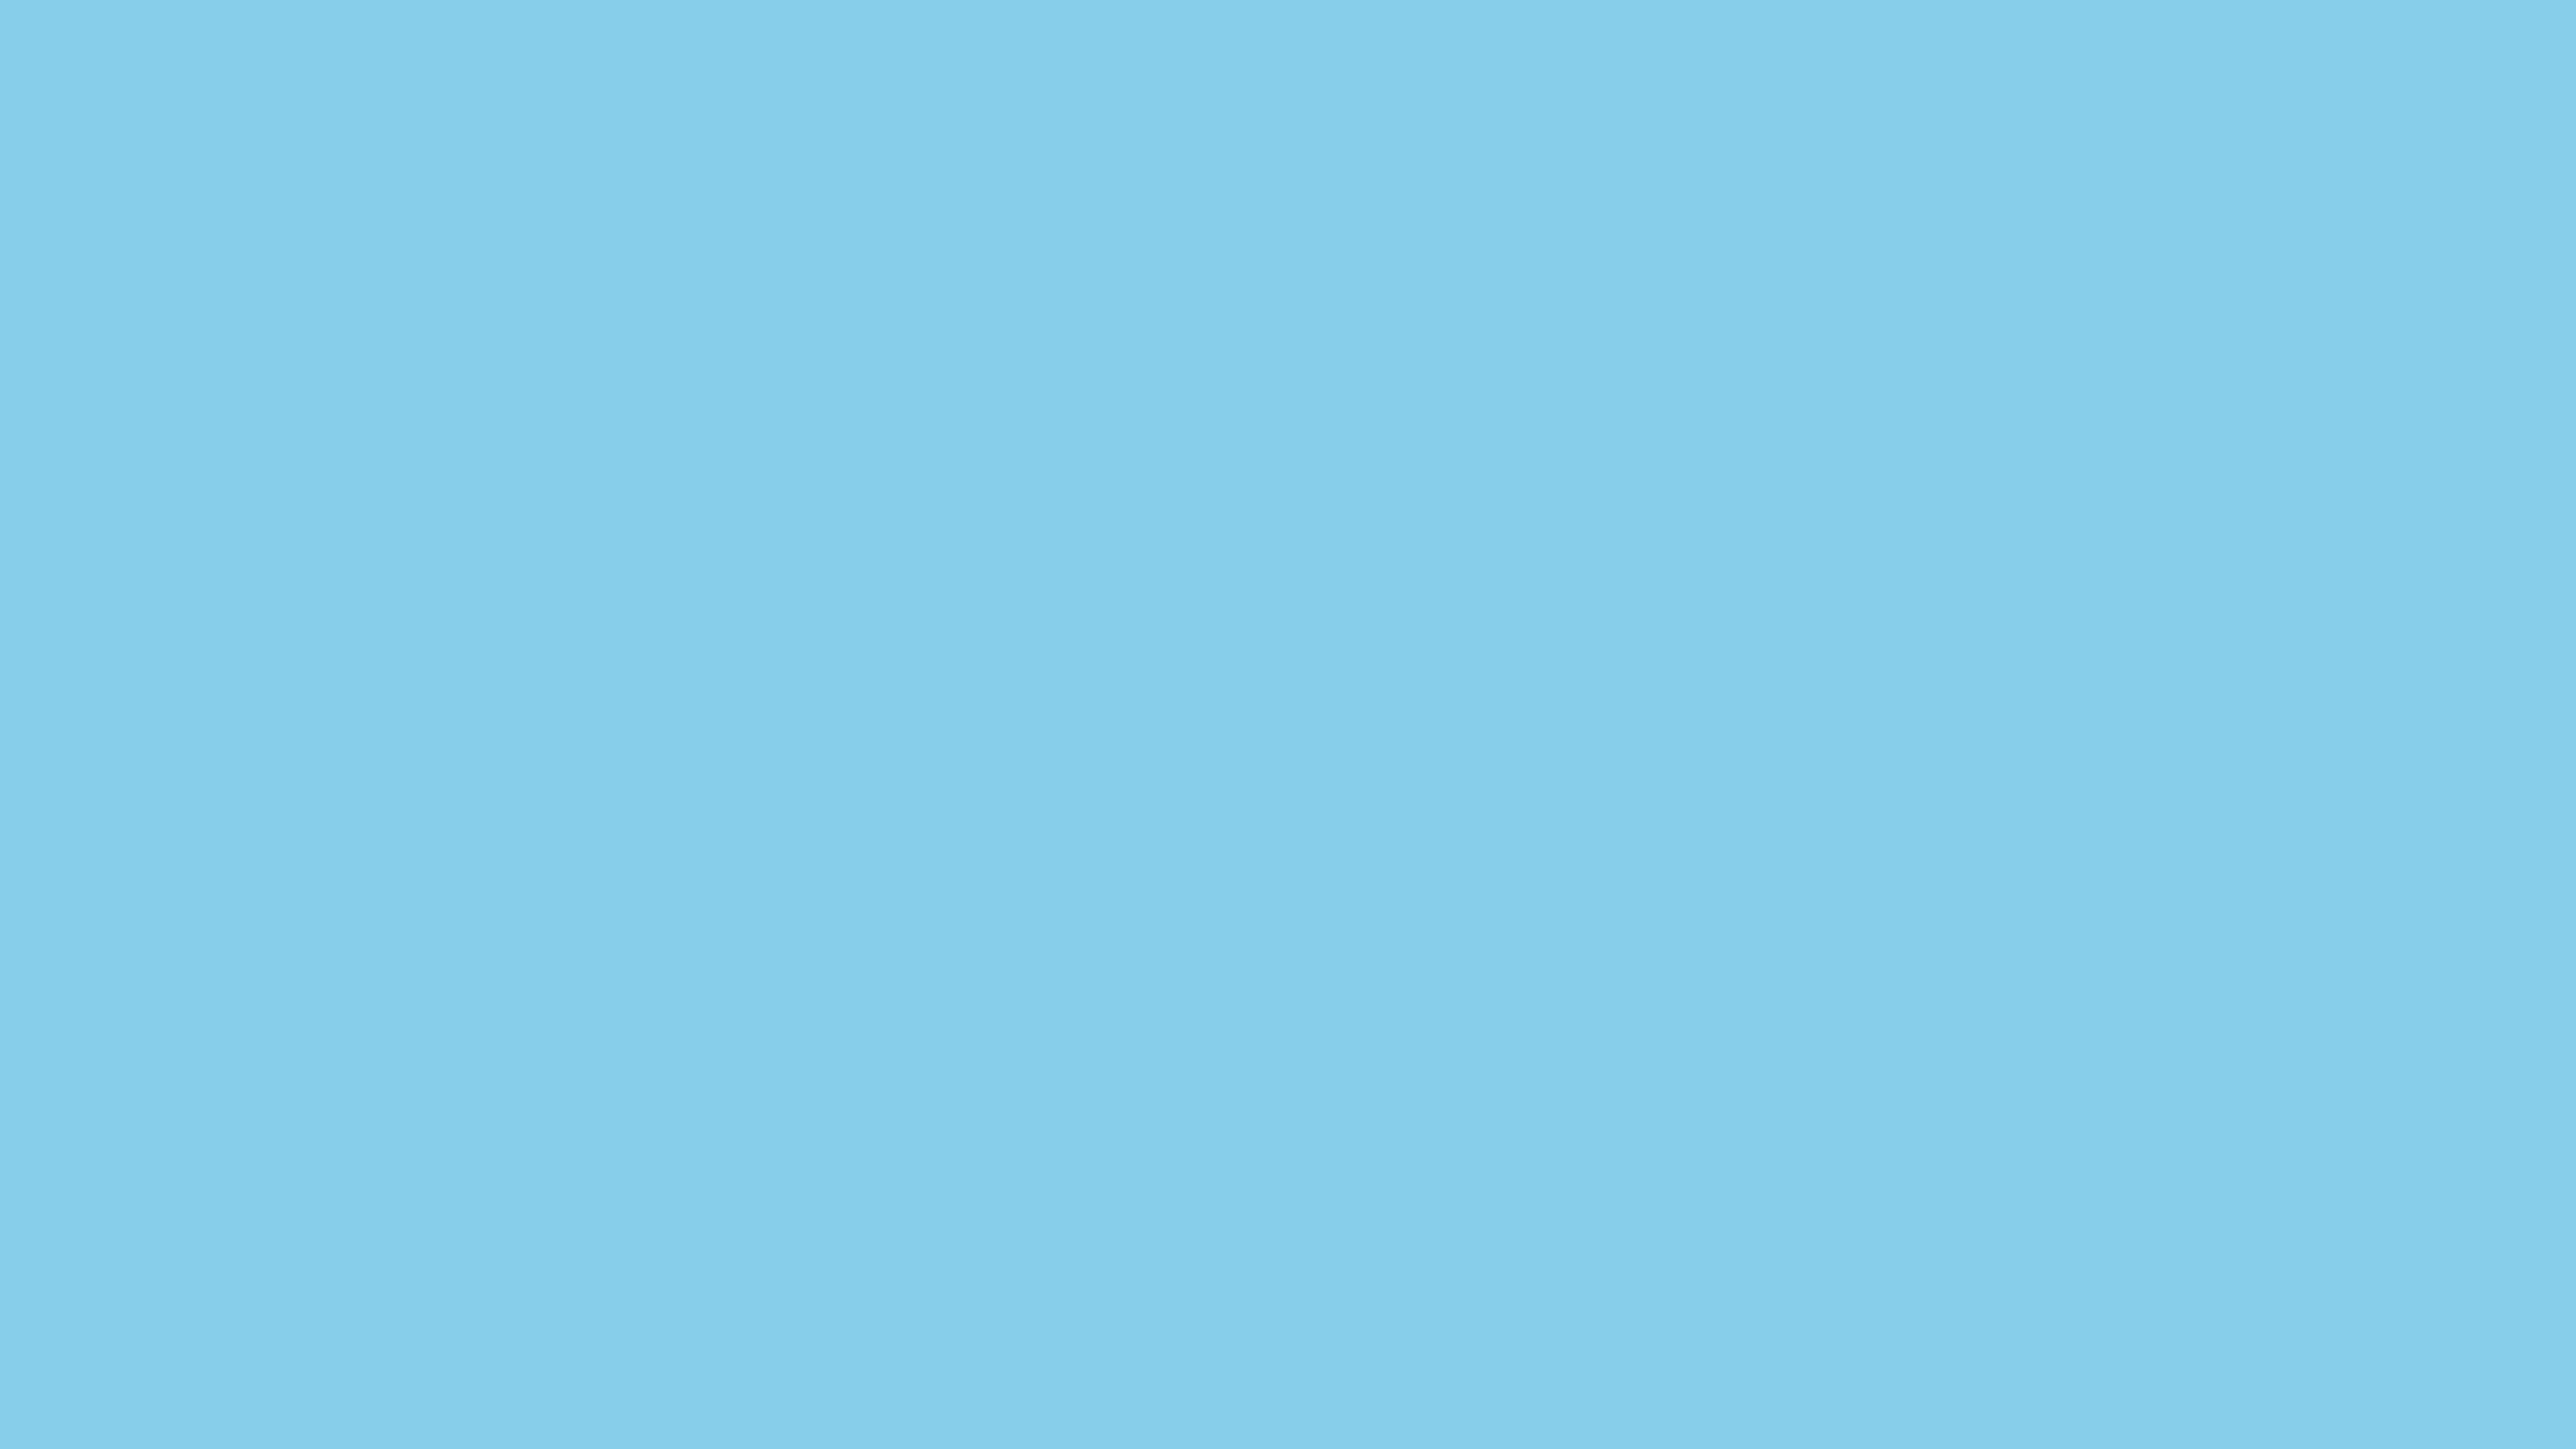 5120x2880 Sky Blue Solid Color Background